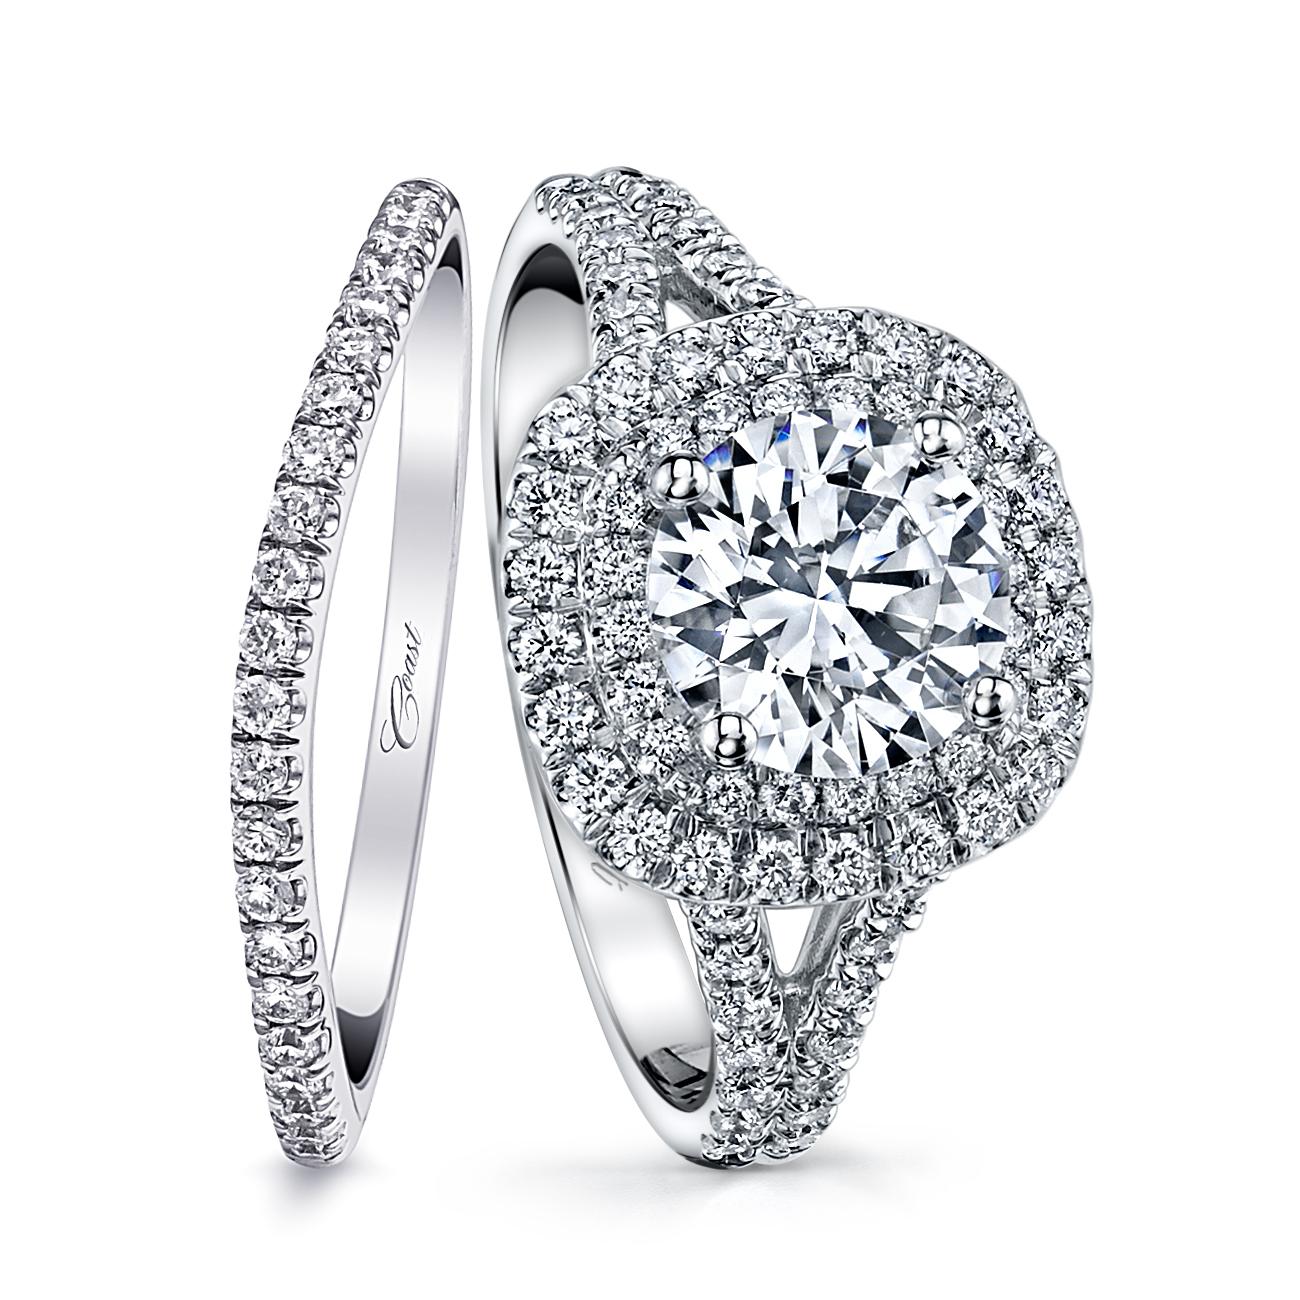 Charisma Engagement Ring - Double Halo